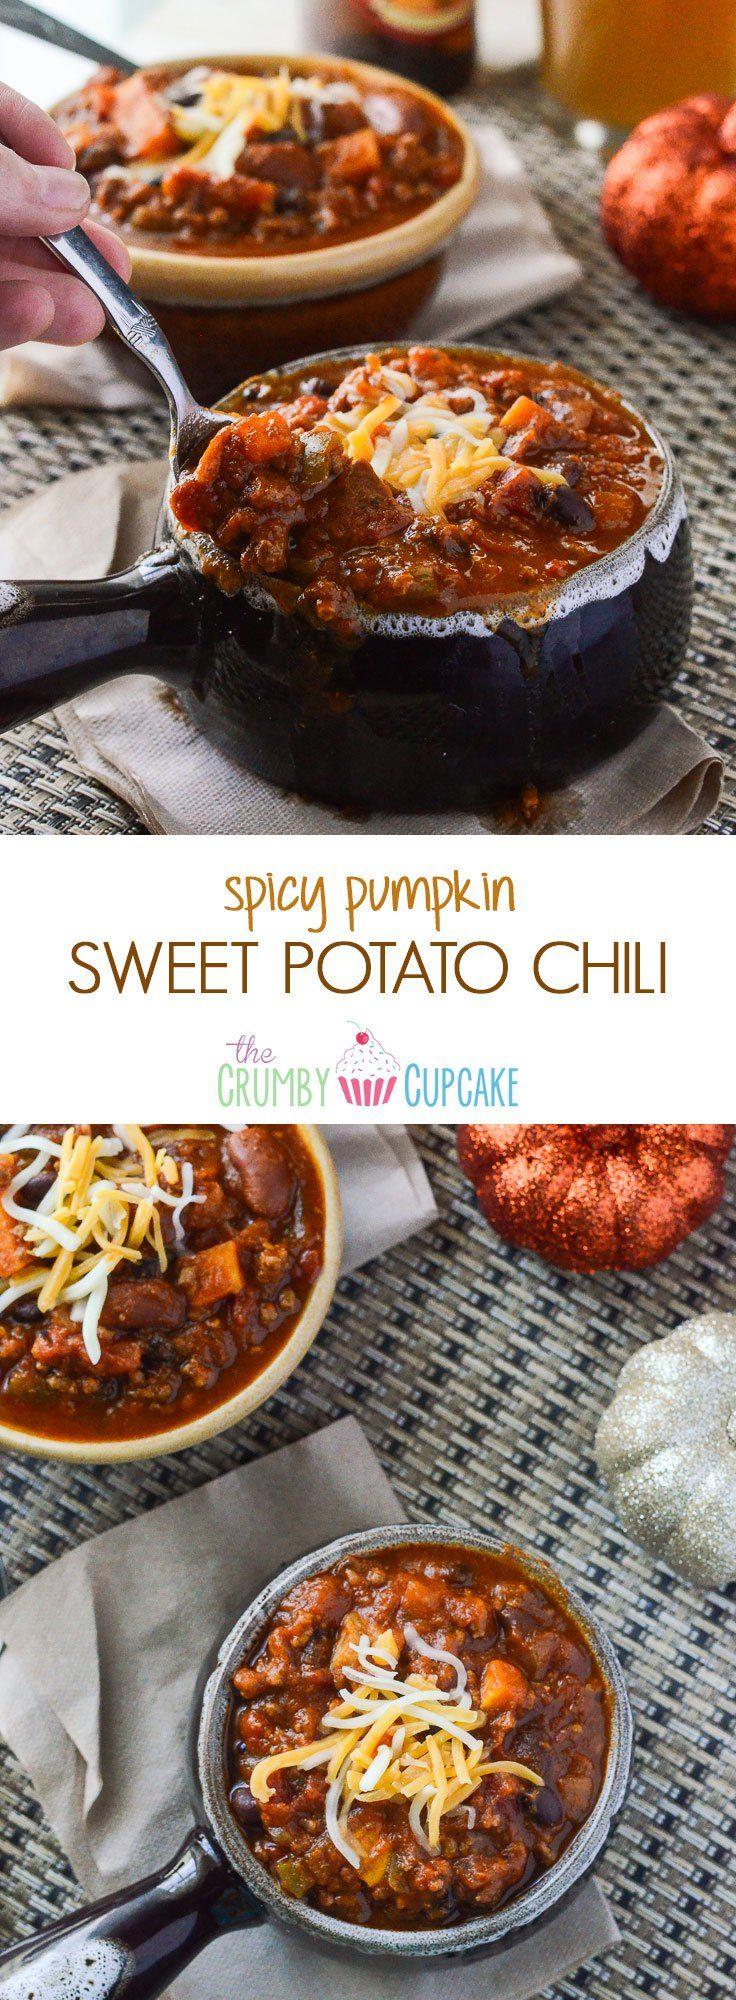 spicy pumpkin sweet potato chili # pumpkinweek crock pot sweet ...